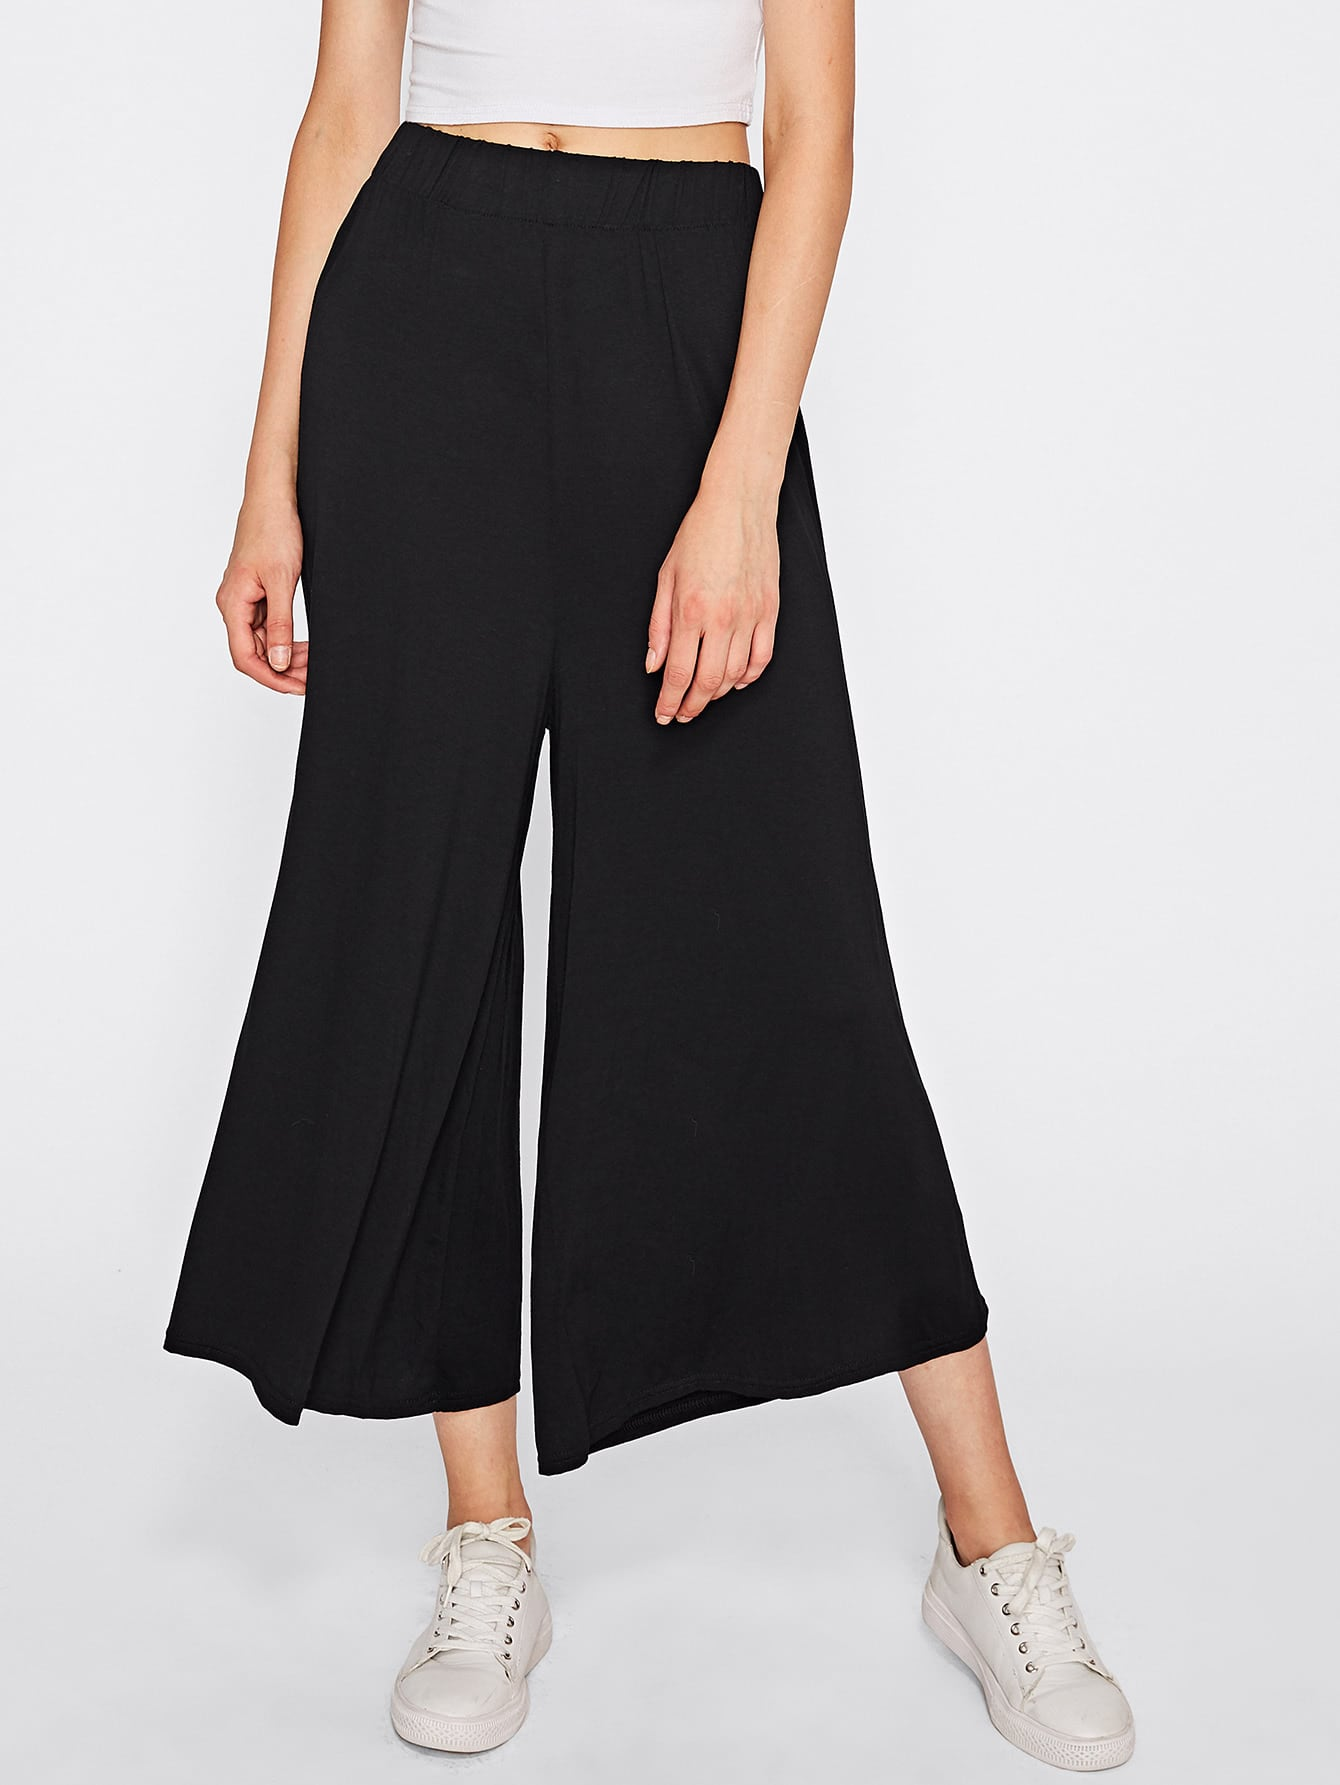 Wide Leg Elastic Waist Pants